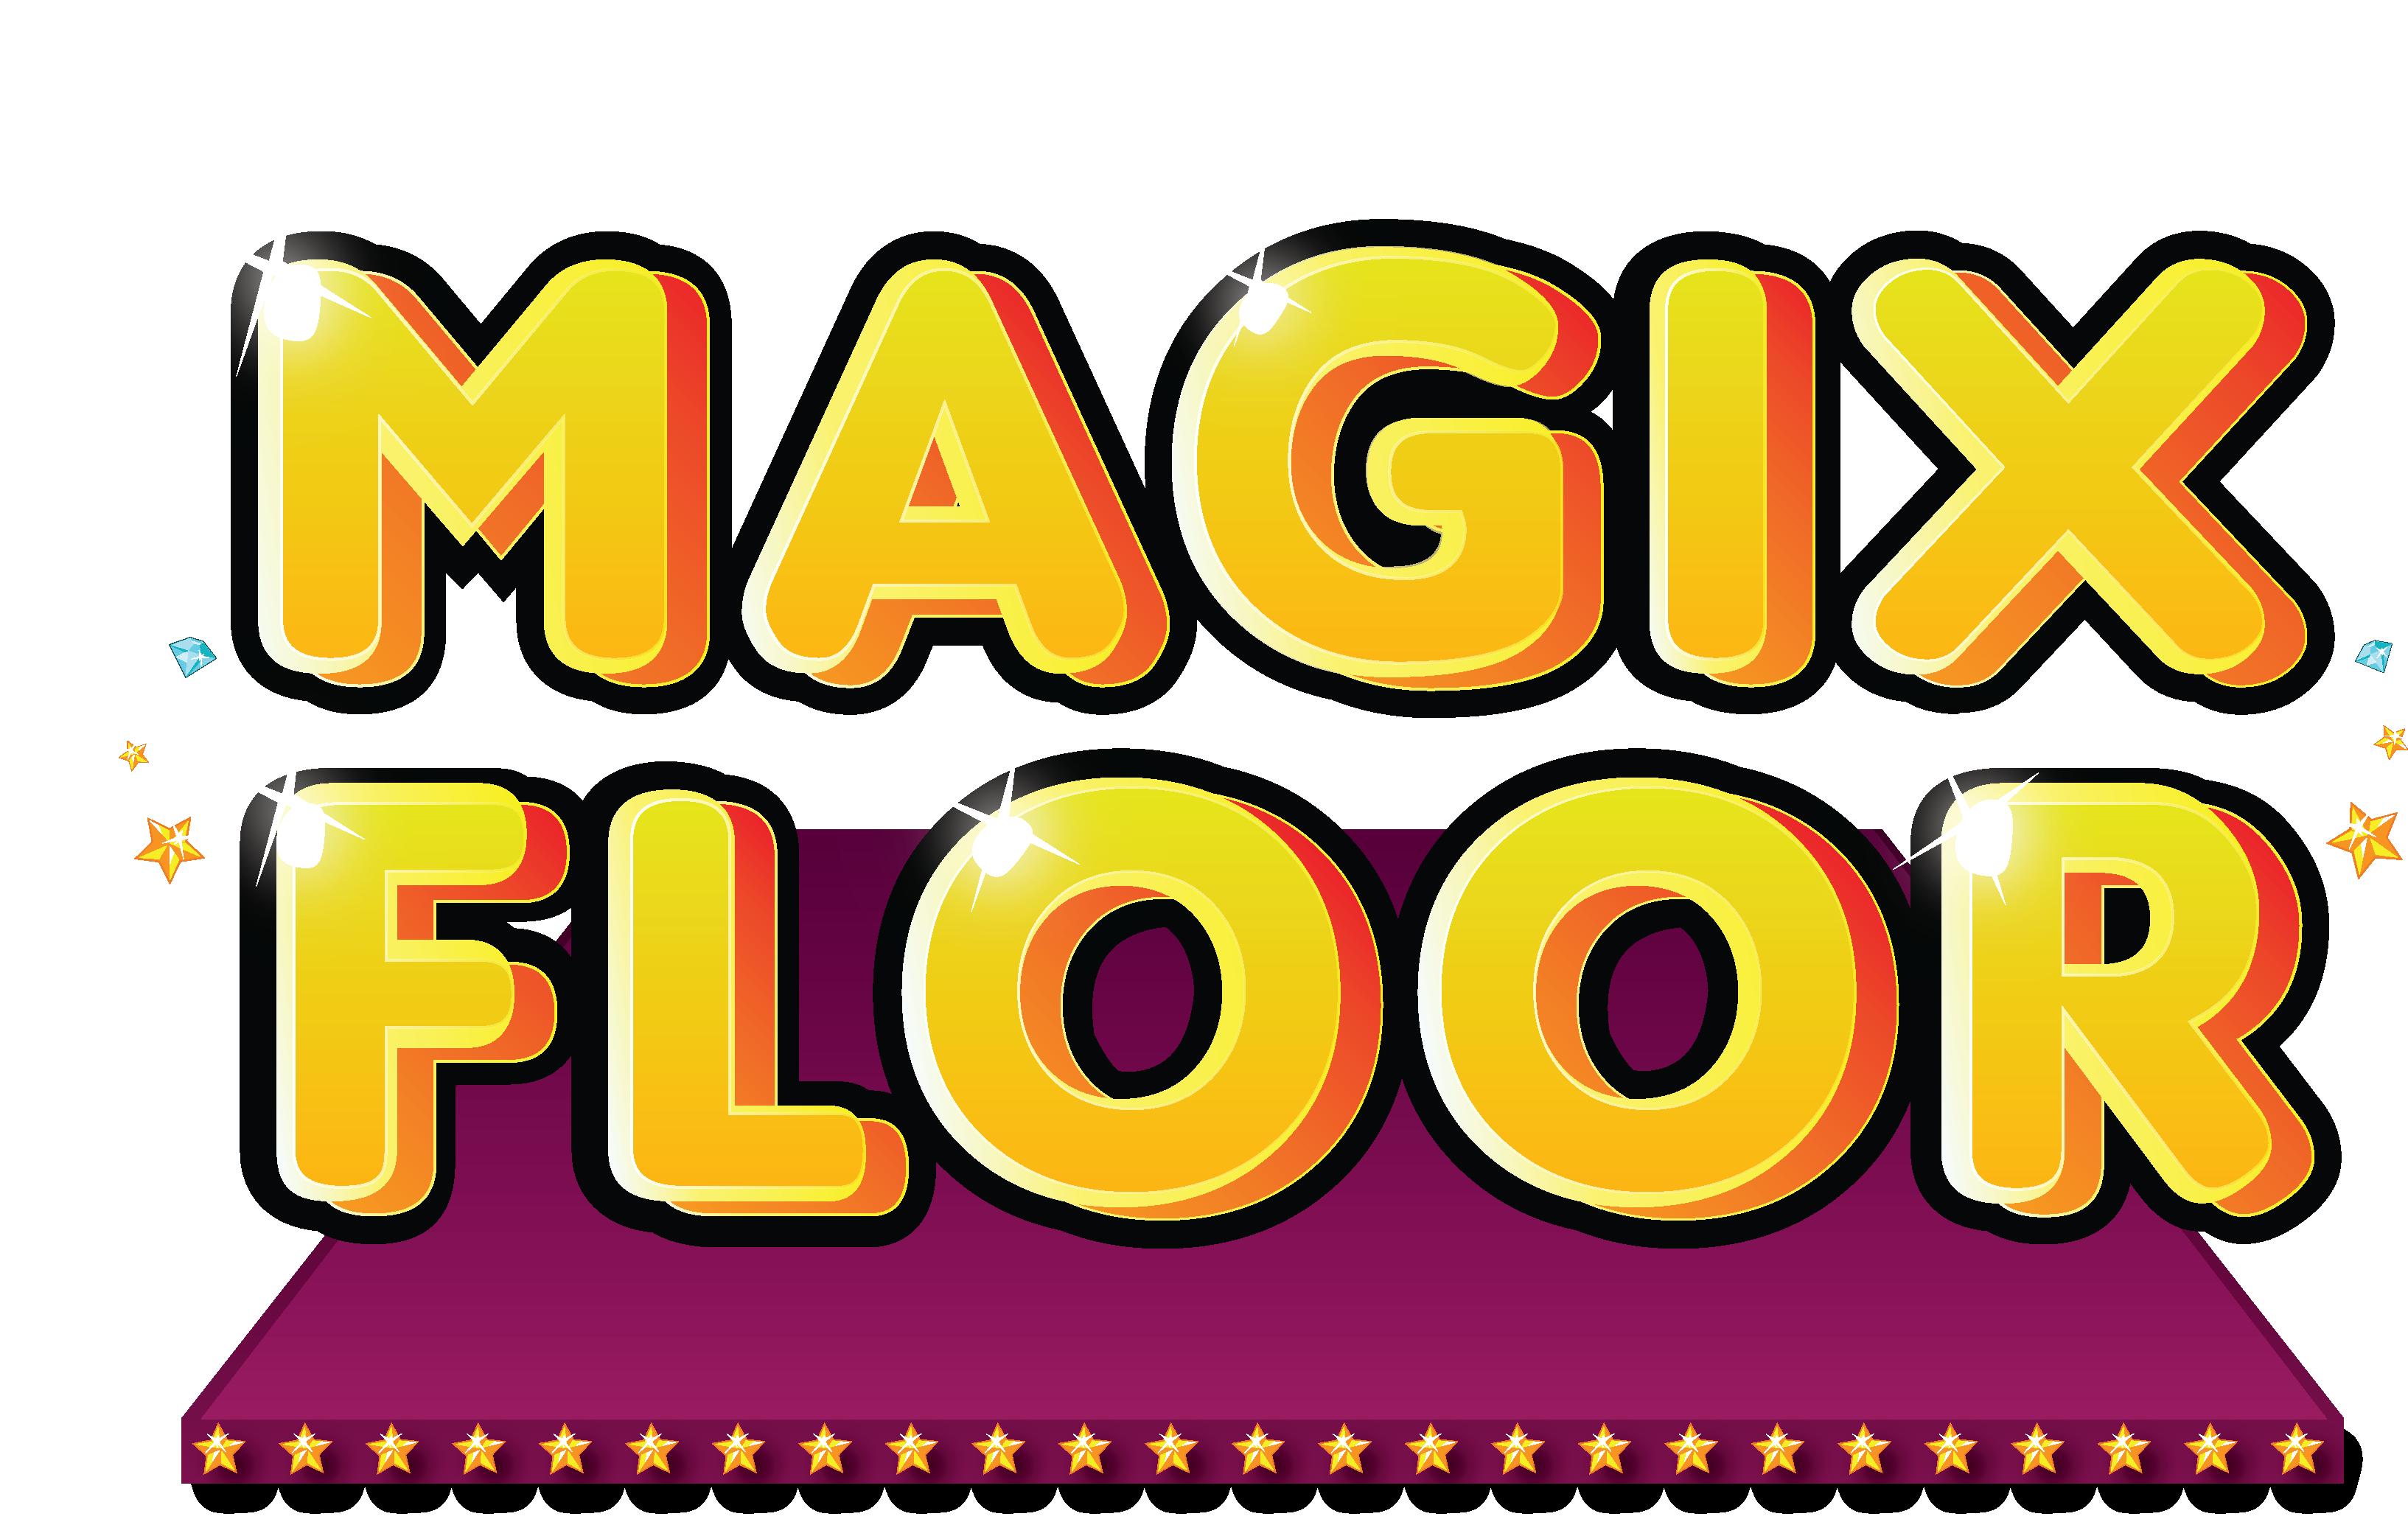 MagixFloor-redemption-arcade-game-logo